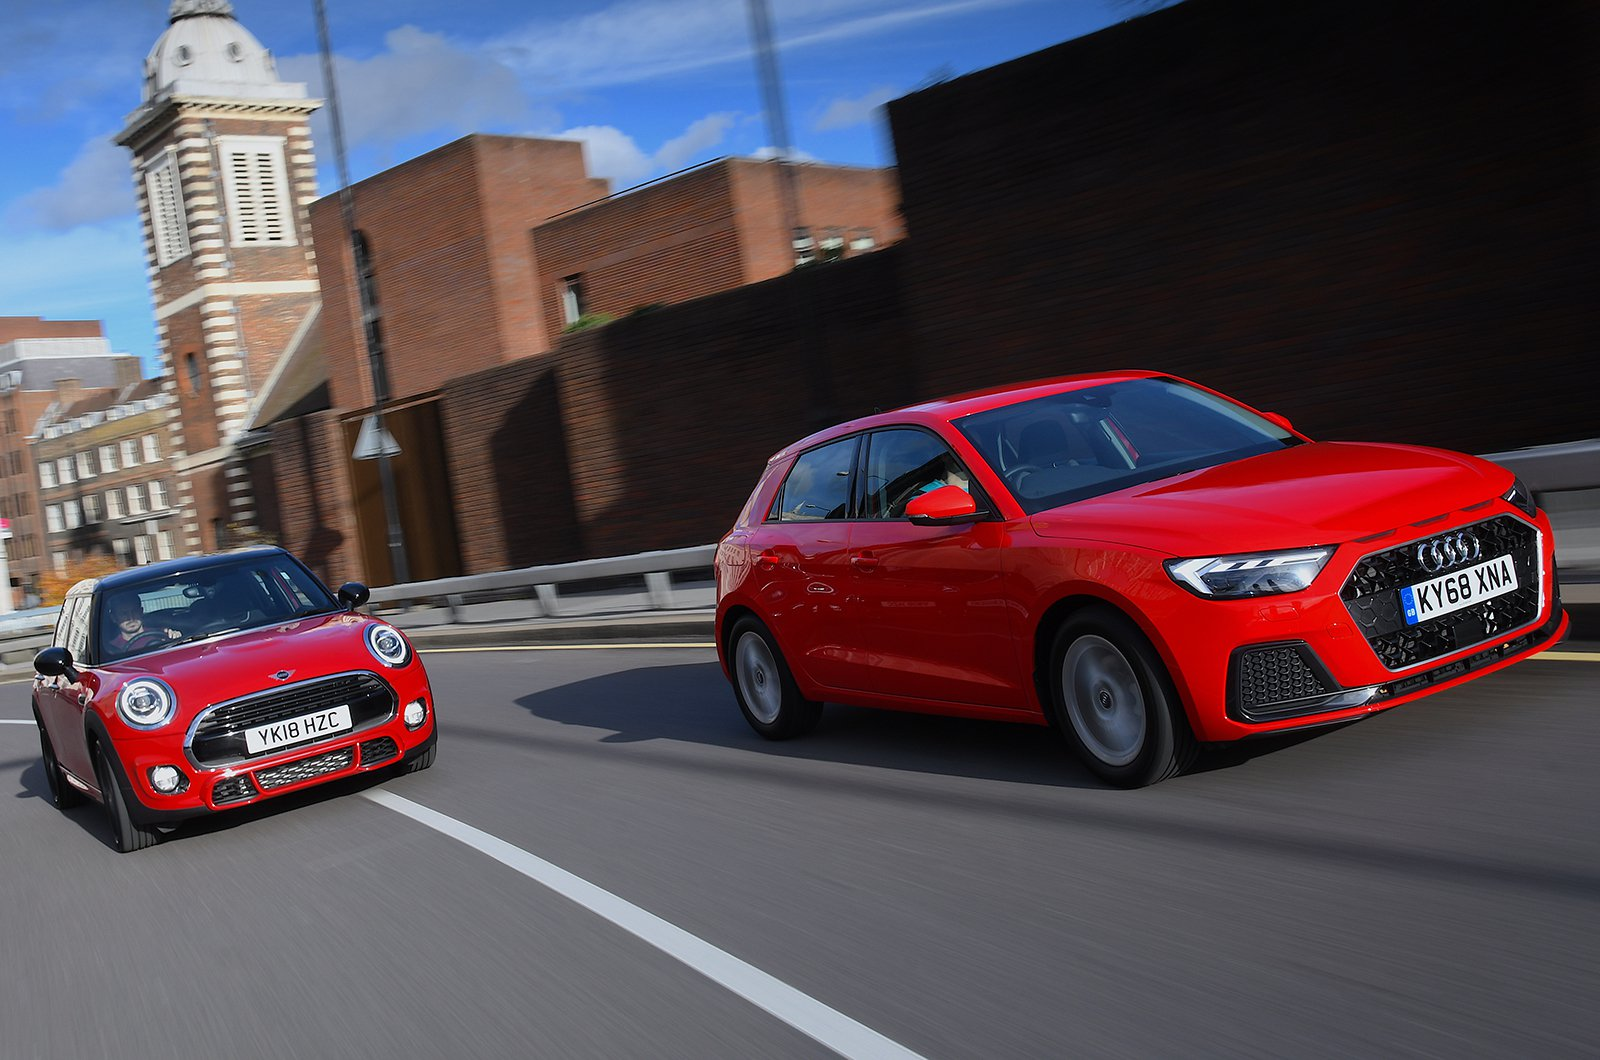 Audi A1 and Mini hatchback